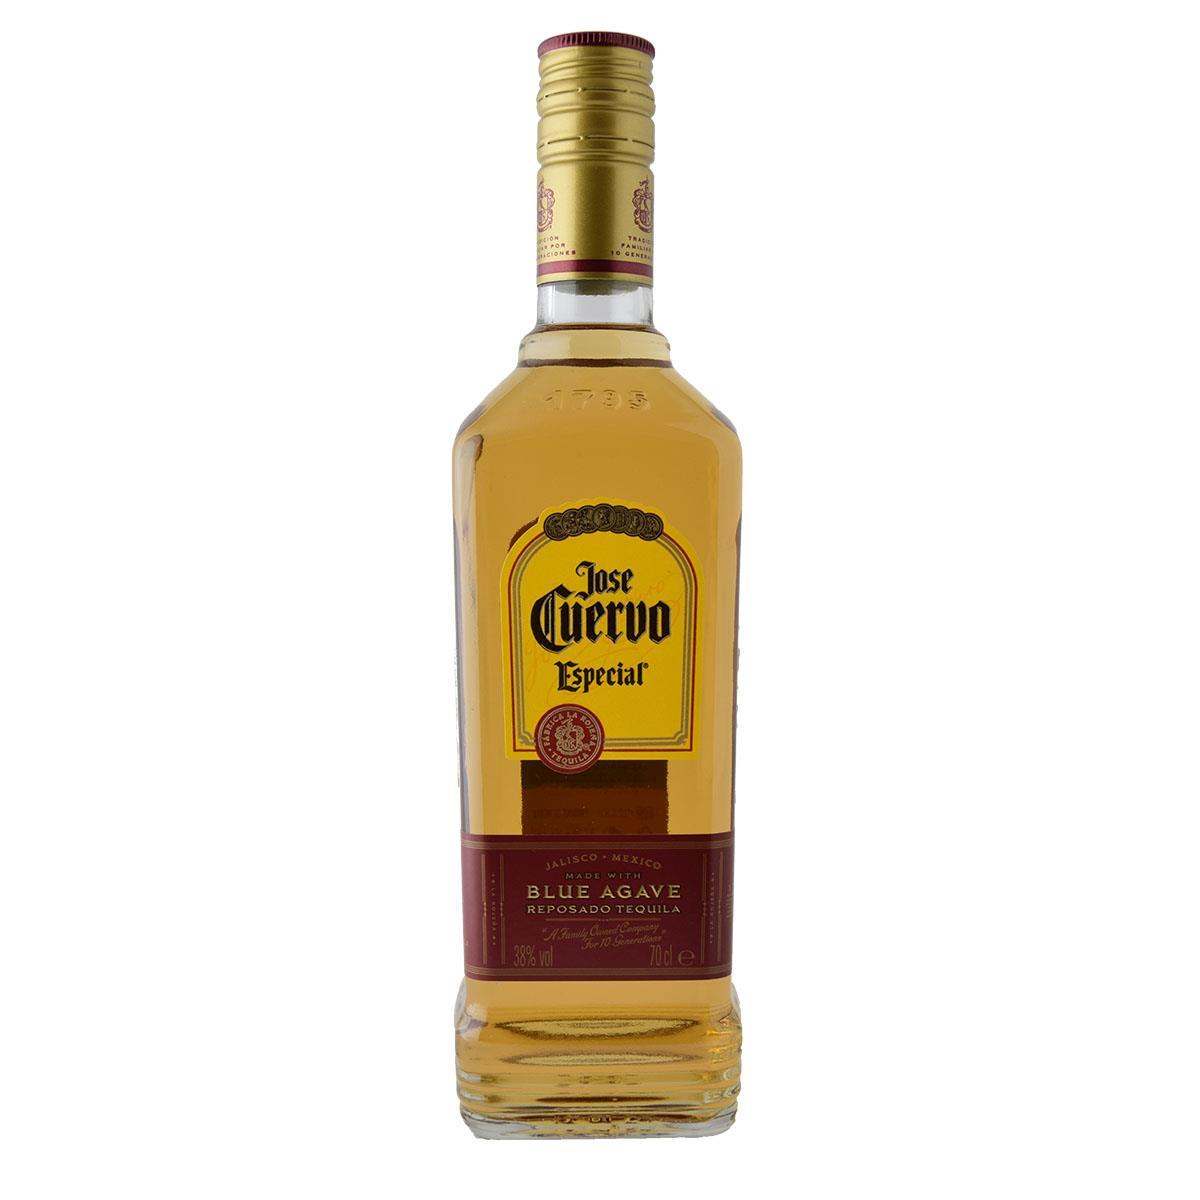 Jose Cuervo Reposado Tequila 700ml